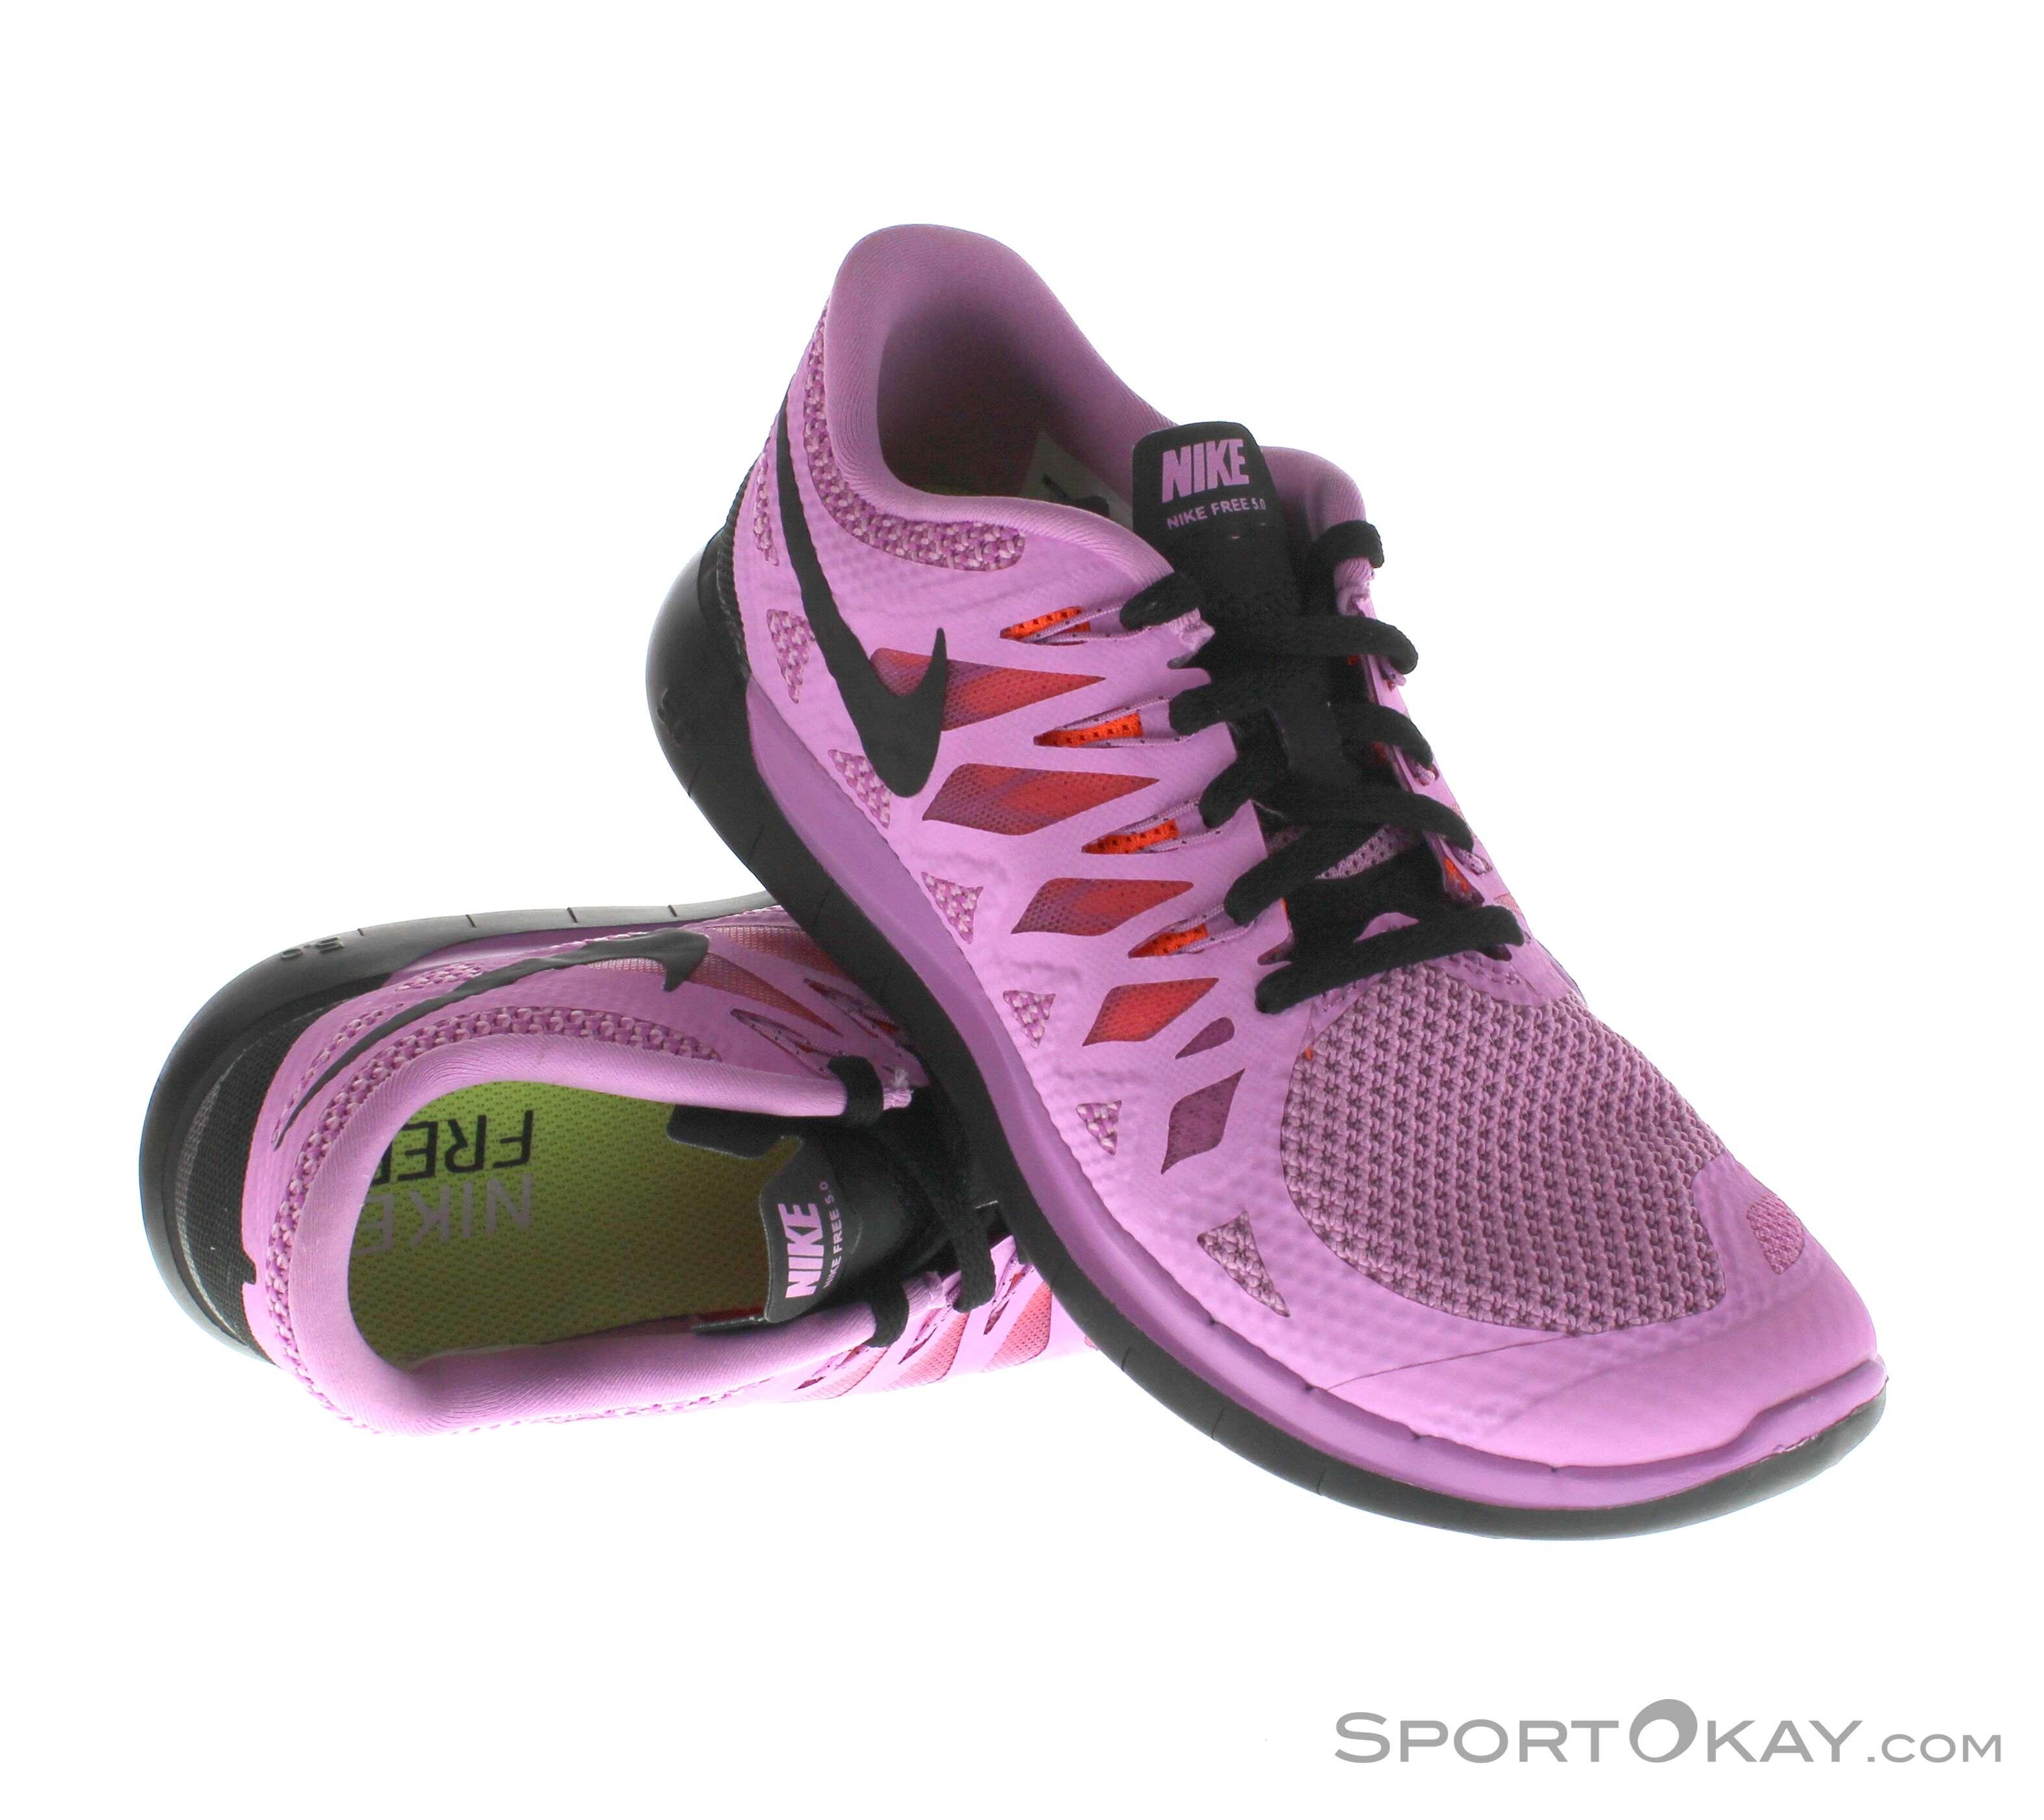 low priced 9c2ff b30e6 ... greece nike free 5.0 womens running shoes nike purple female 0026 3e16d  d1562